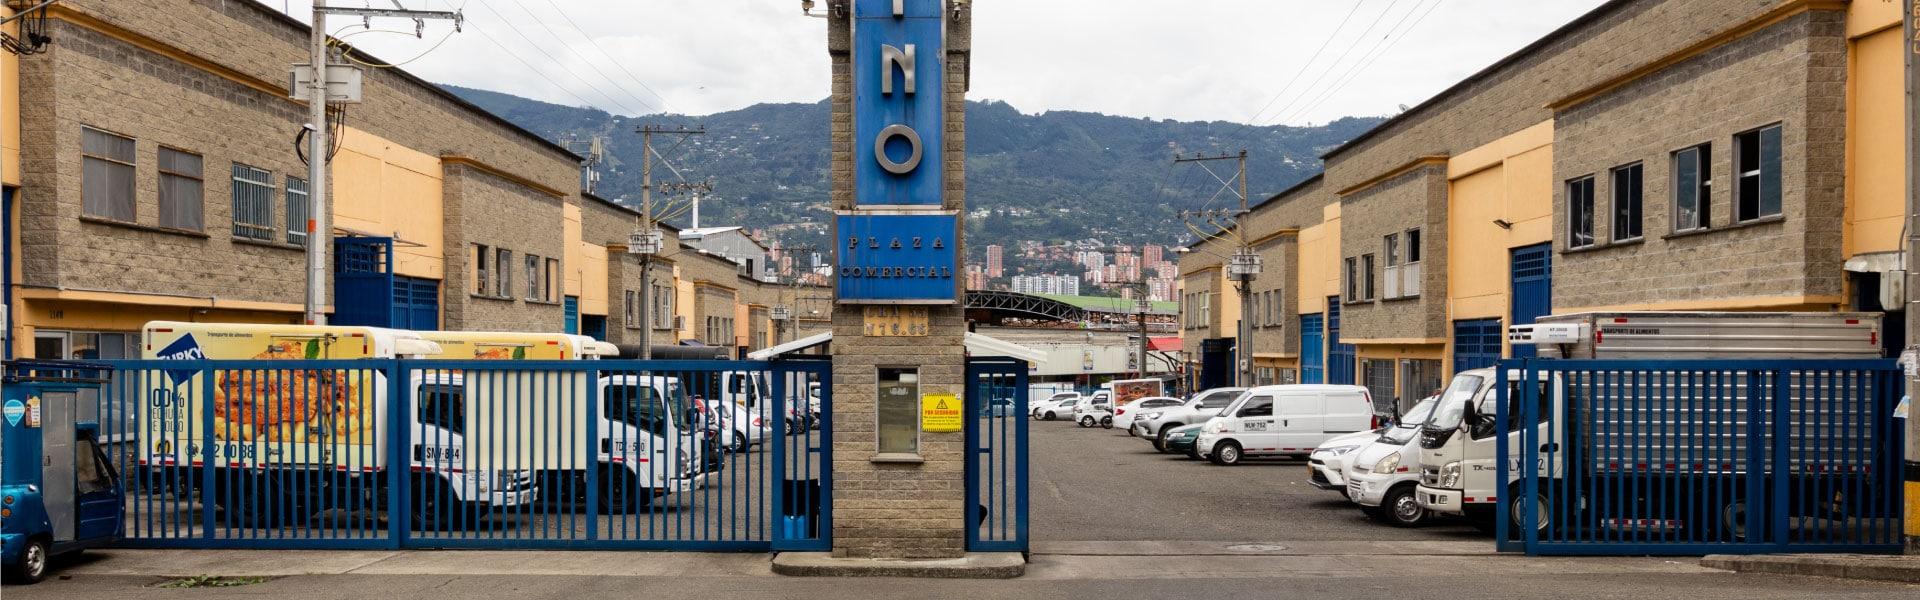 Platino Plaza Industrial 1920